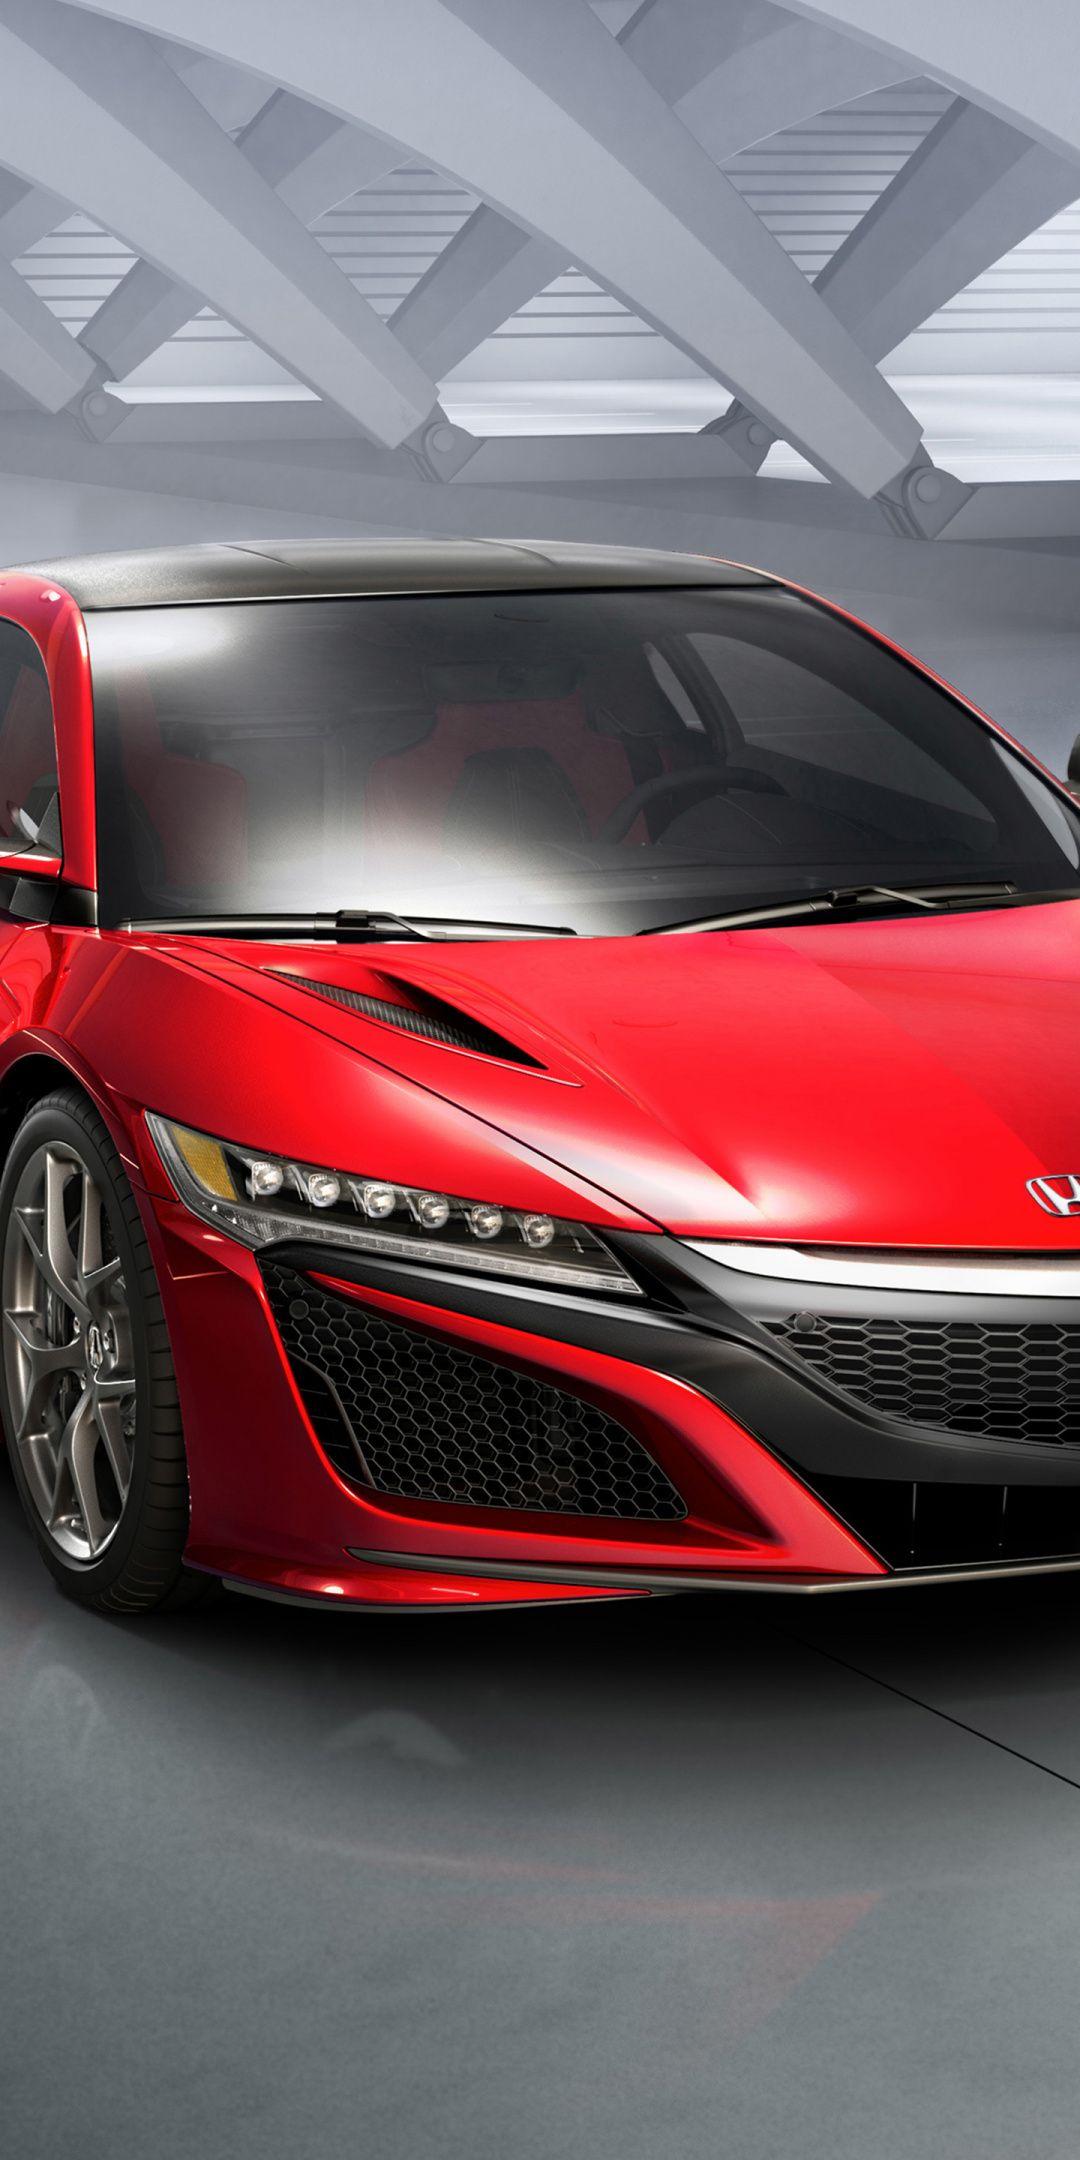 Honda Nsx Red Car Sports Car Front 1080x2160 Wallpaper